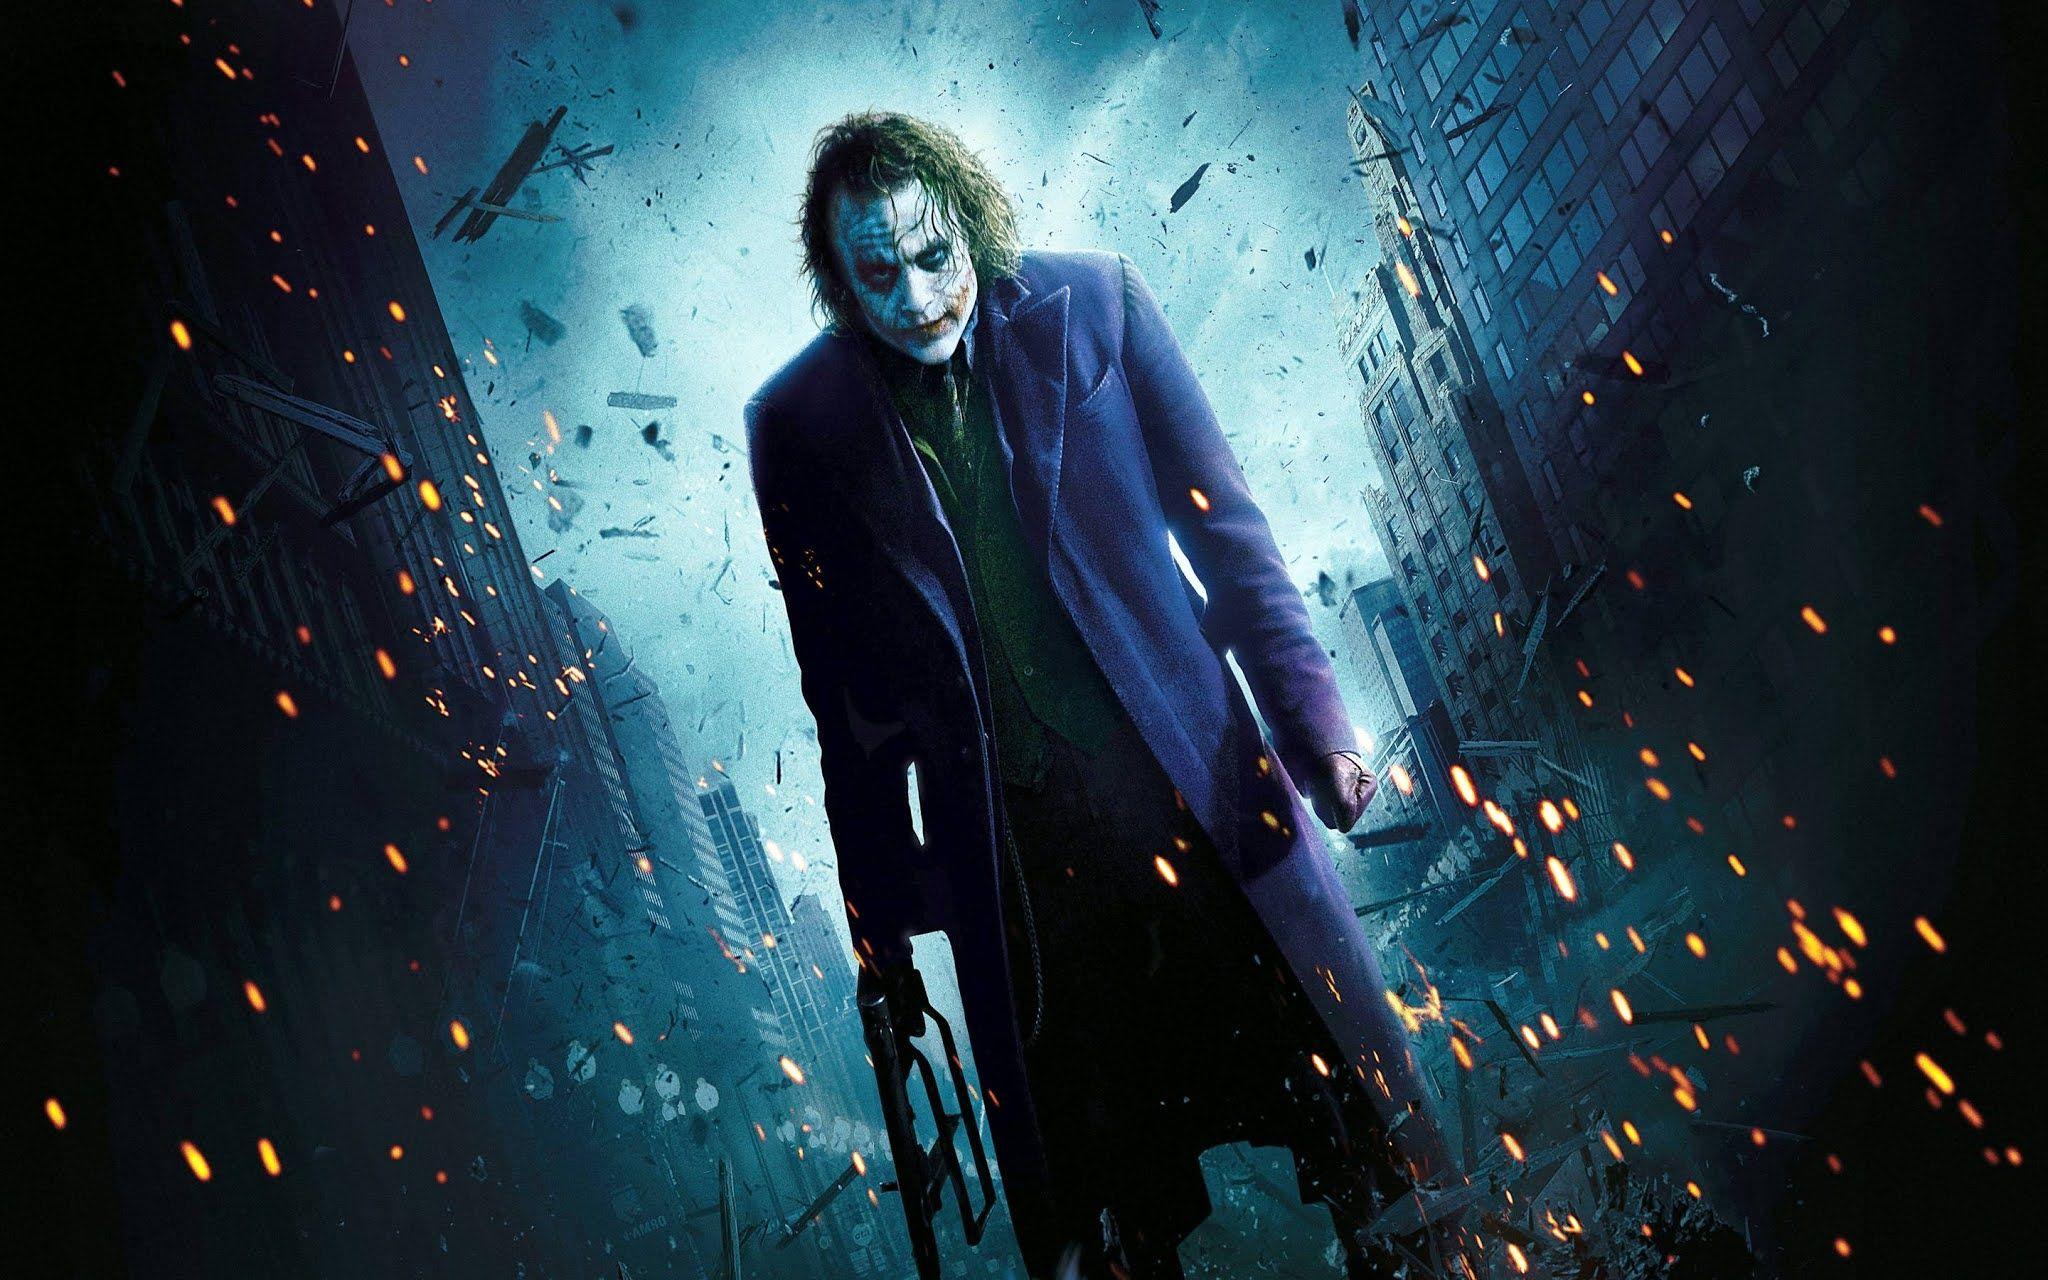 Joker Wallpaper For Pc Download Hd Images Collection Of Joker Download Mobile Joker Wallpaper Download Joker Hd Wallpaper Joker Wallpapers Joker Images Joker hd wallpaper 4k download for pc